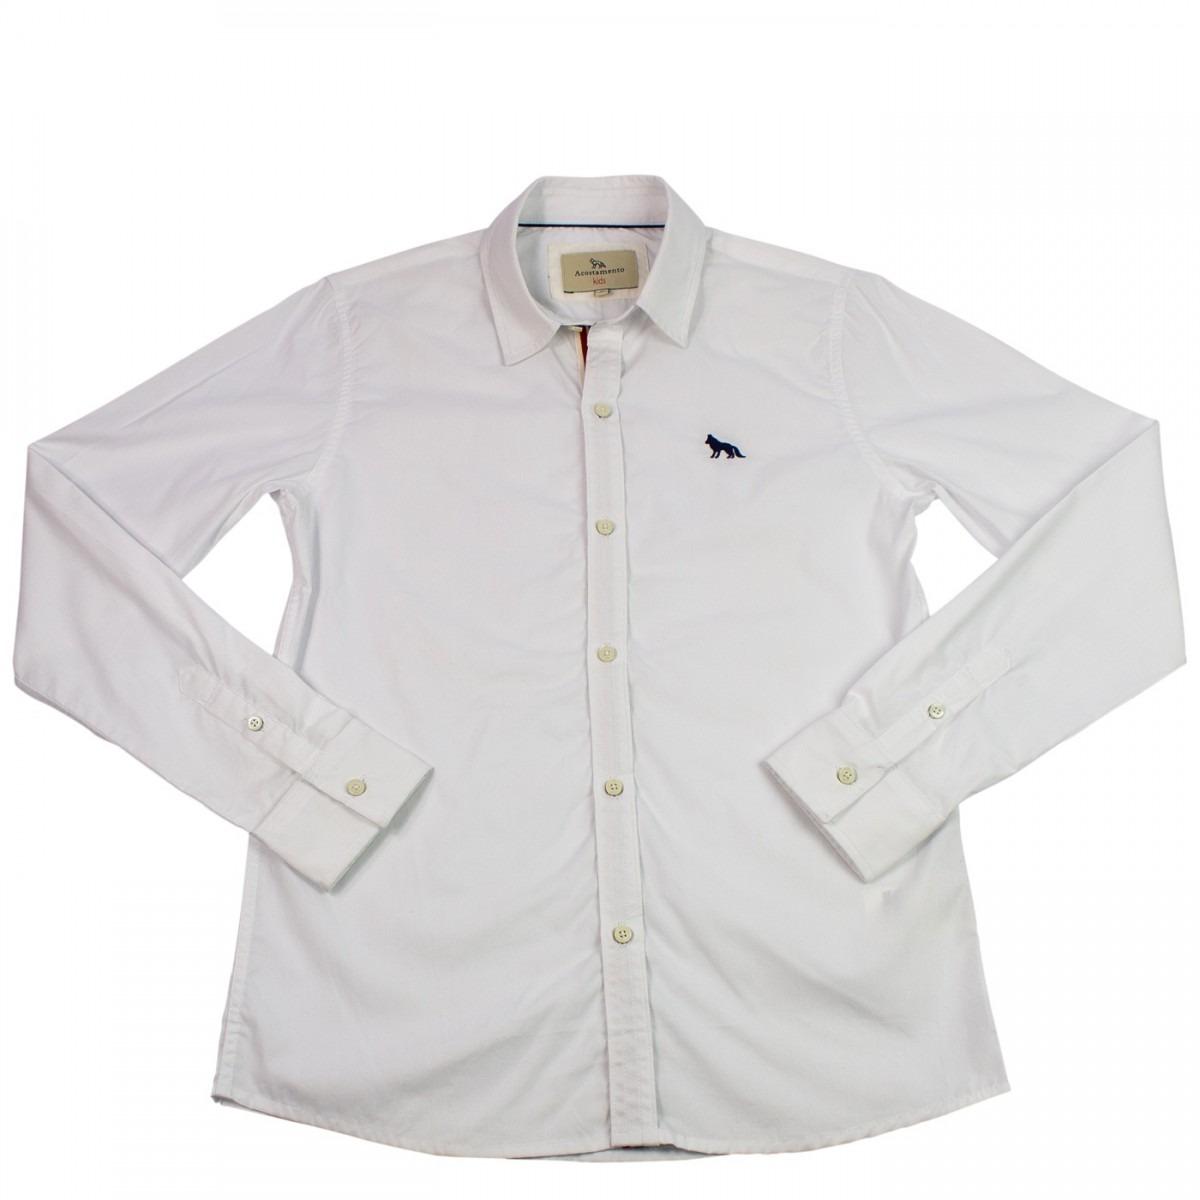 bd7a46d17fbb4 Camisa Social Infantil Menino Acostamento Manga Longa - R  198